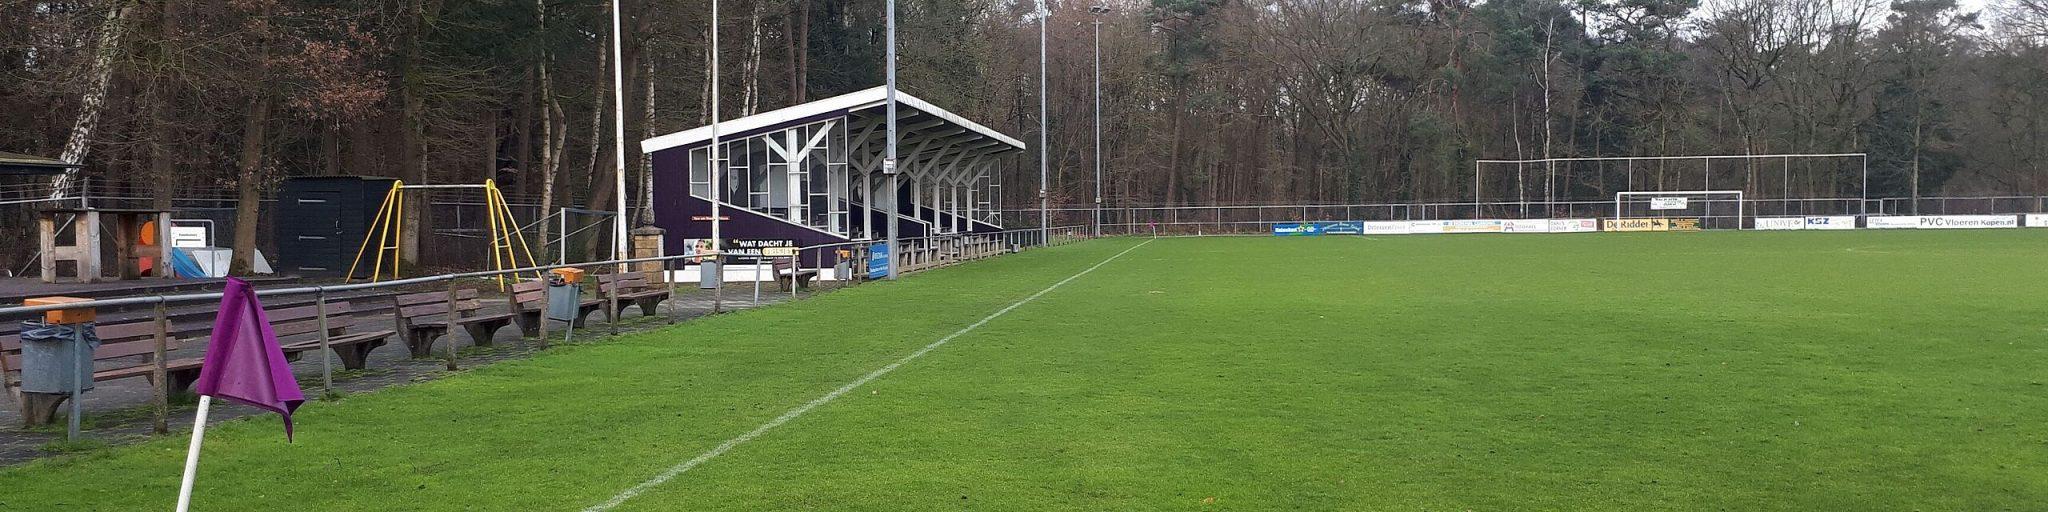 Renovatie Sportpark Dijnselburg